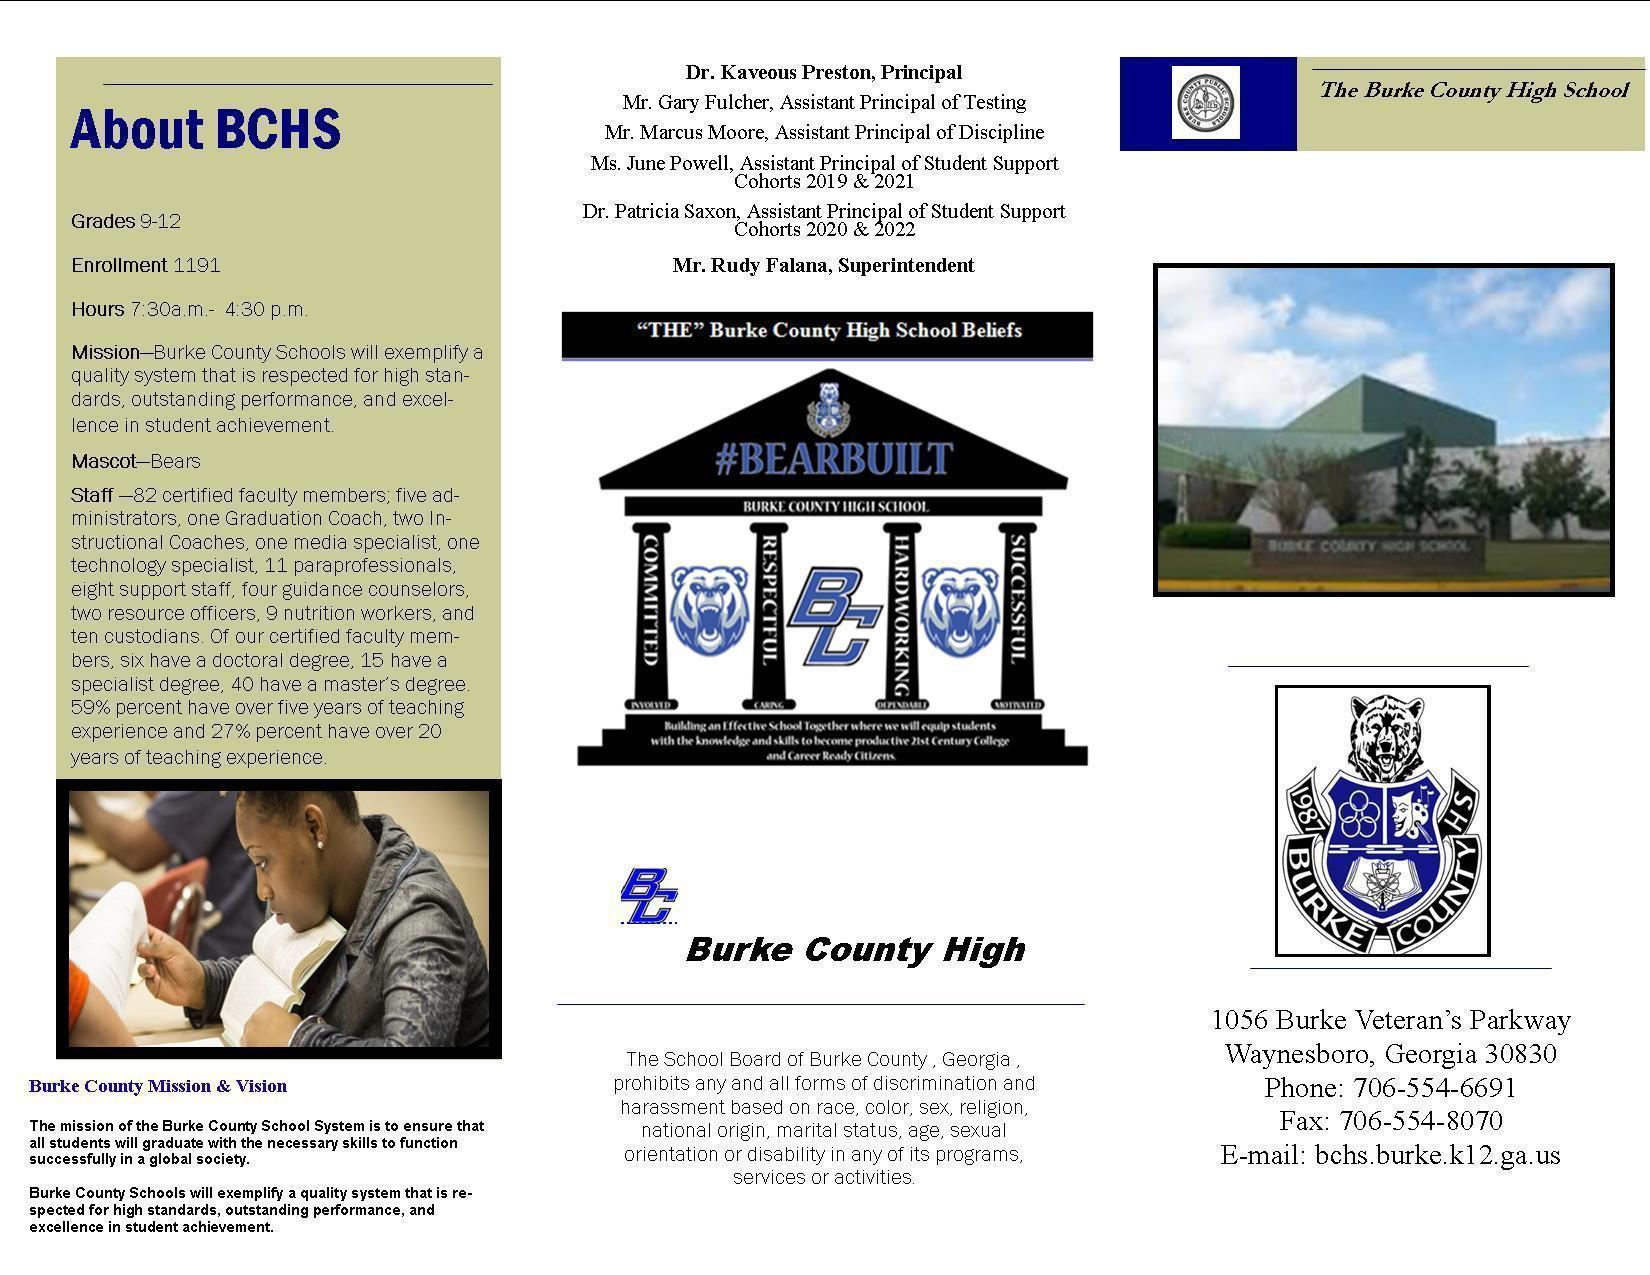 Pamphlet for BCHS Side 1